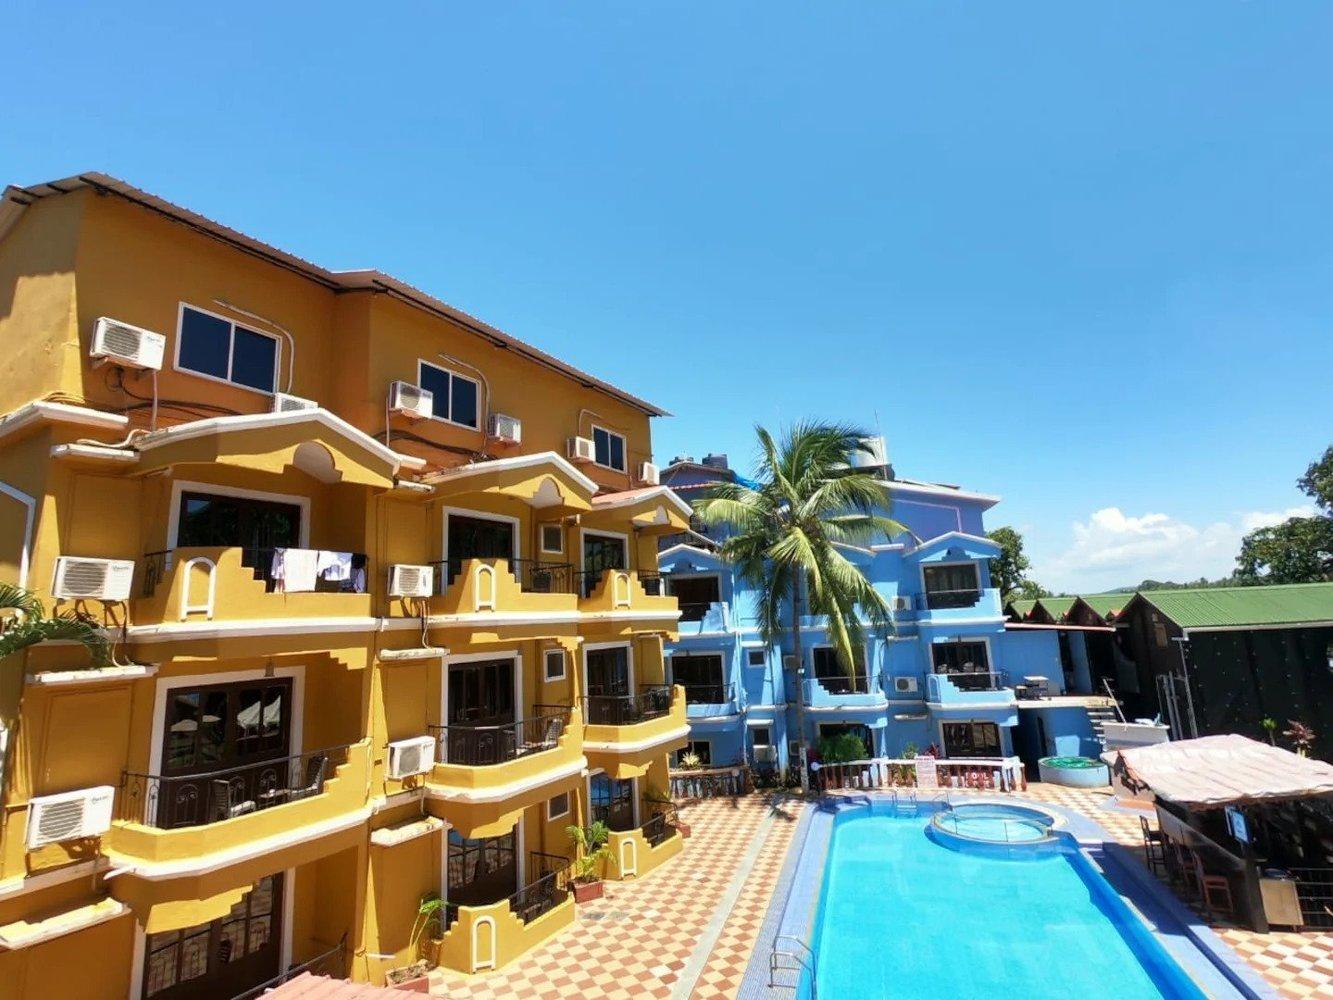 Camelot Fantasy Resort - Baga